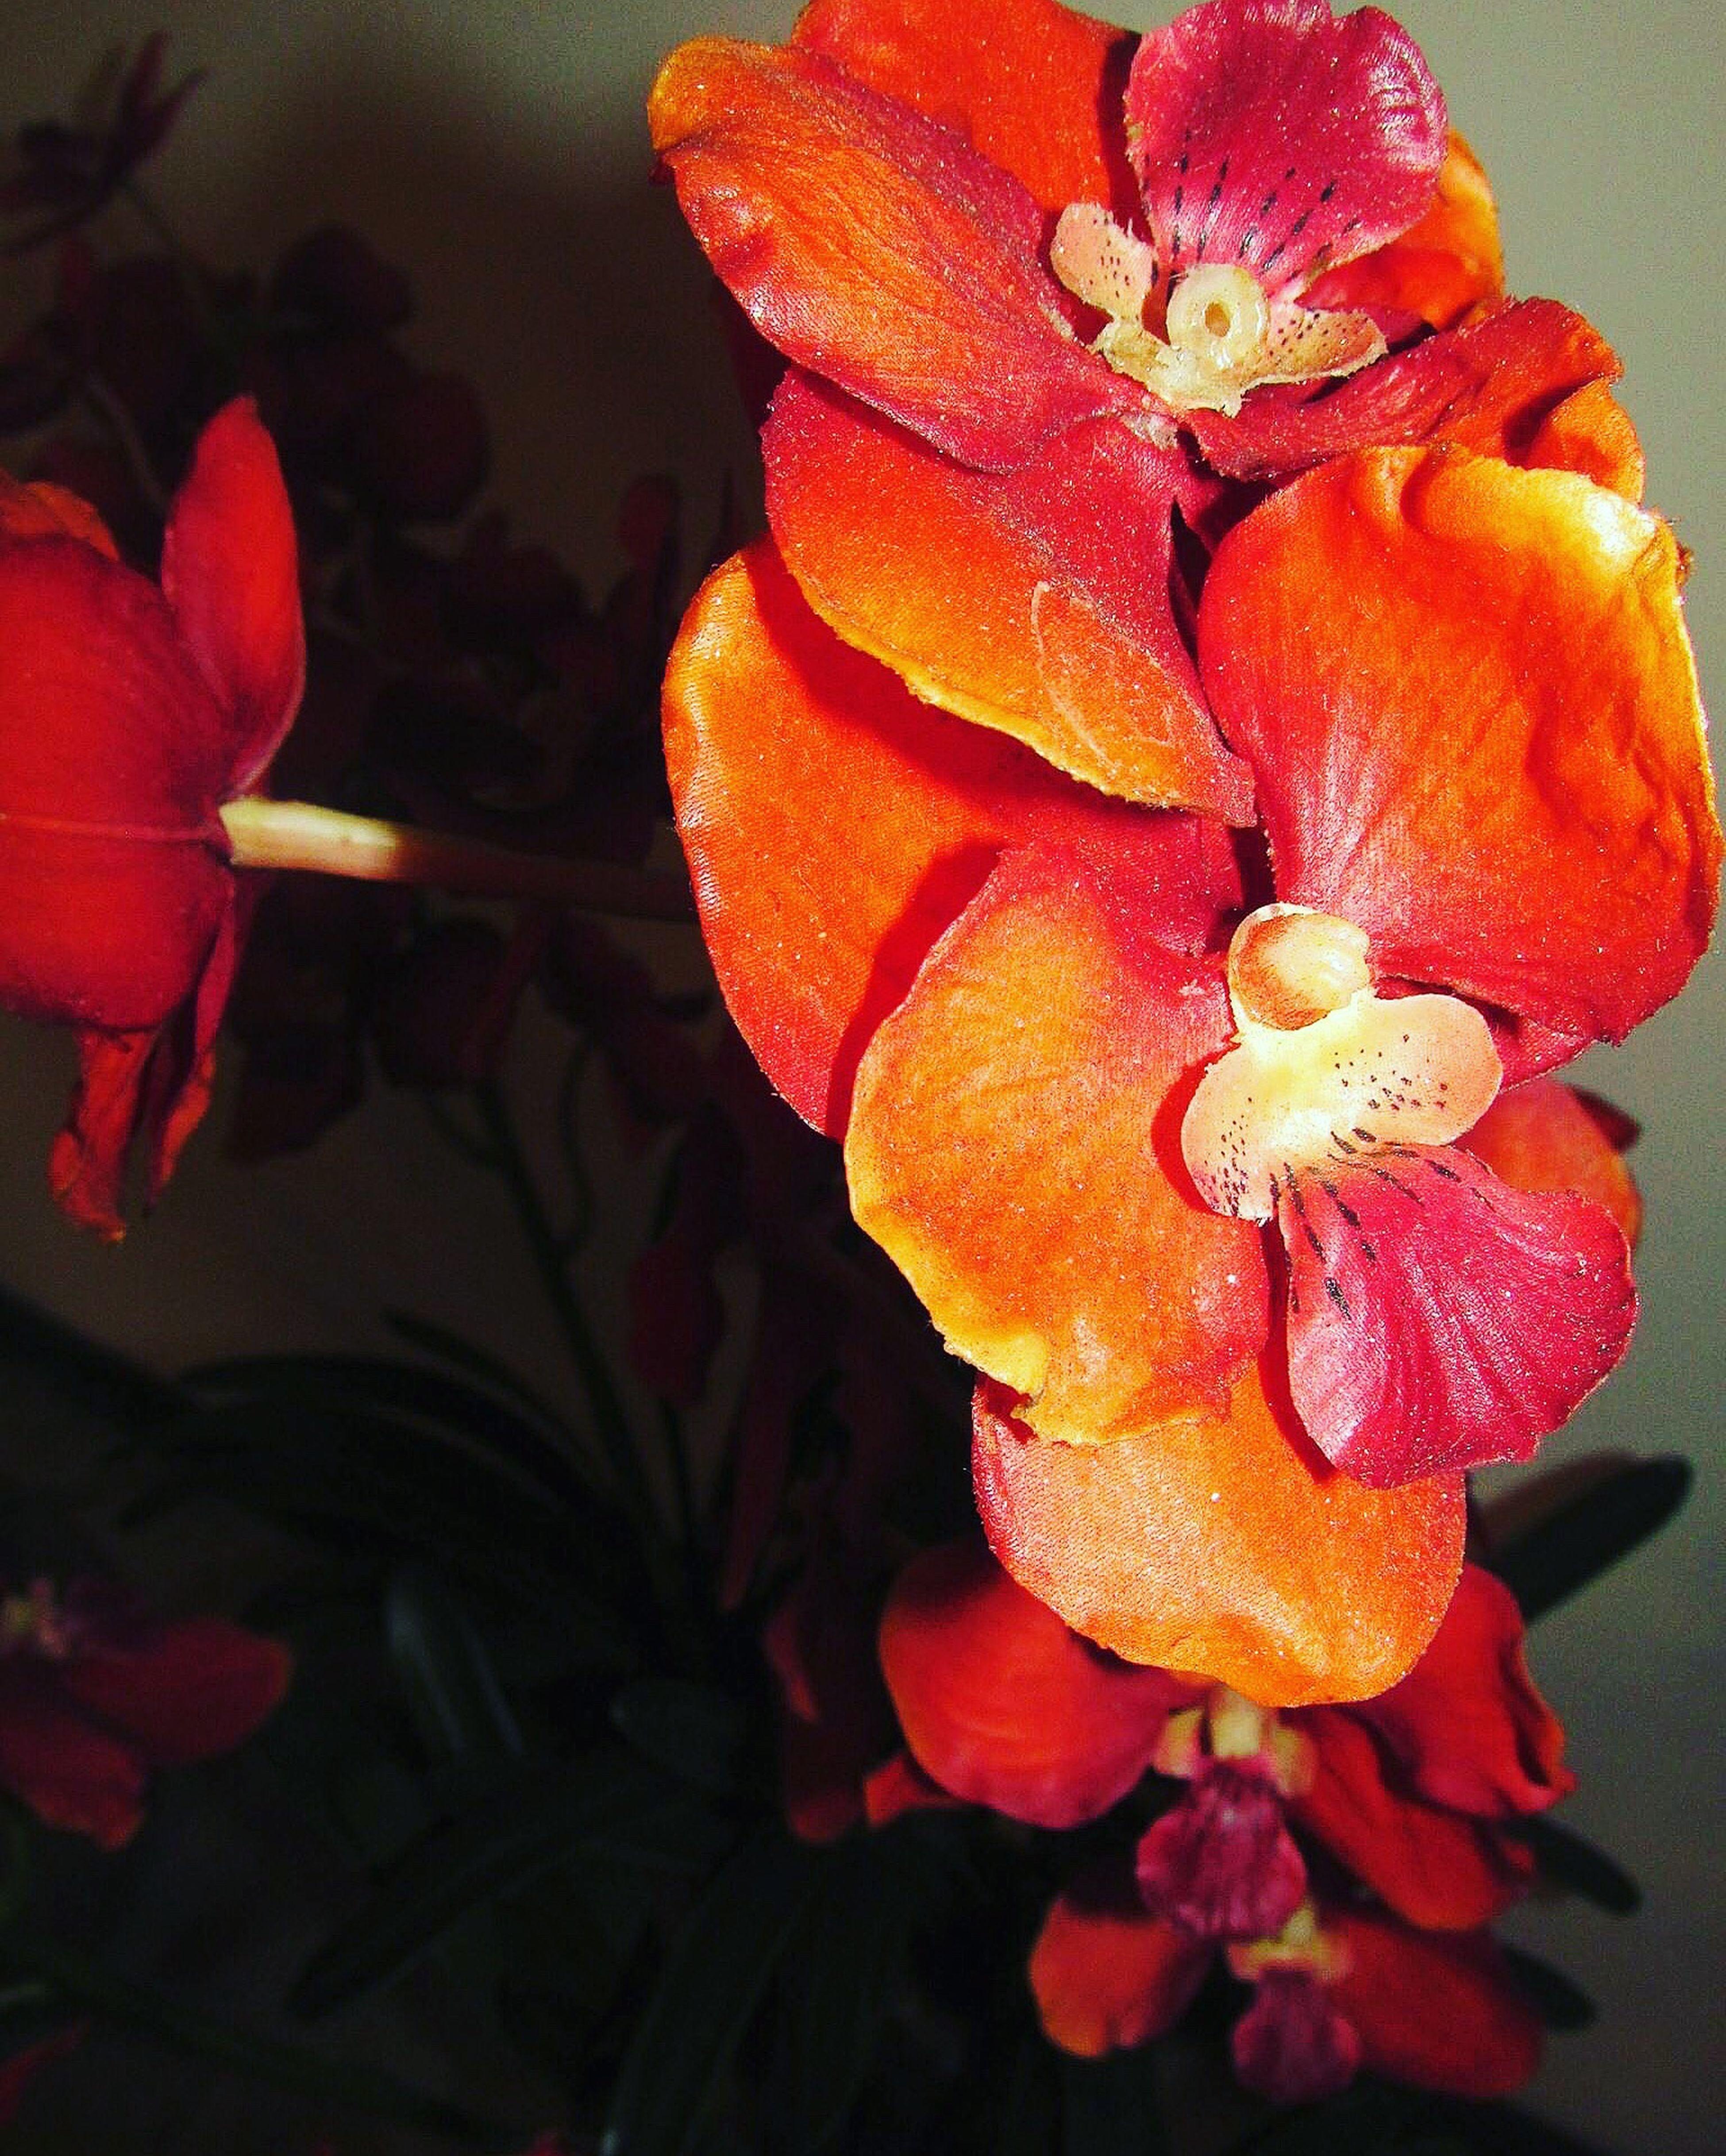 📸 #flores #flowers #natureza #orquideas #color #paisagismo #garden #photo #picture #photographer #iphone #fashionmall #shopping #saoconrado #riodejaneiro #brasil